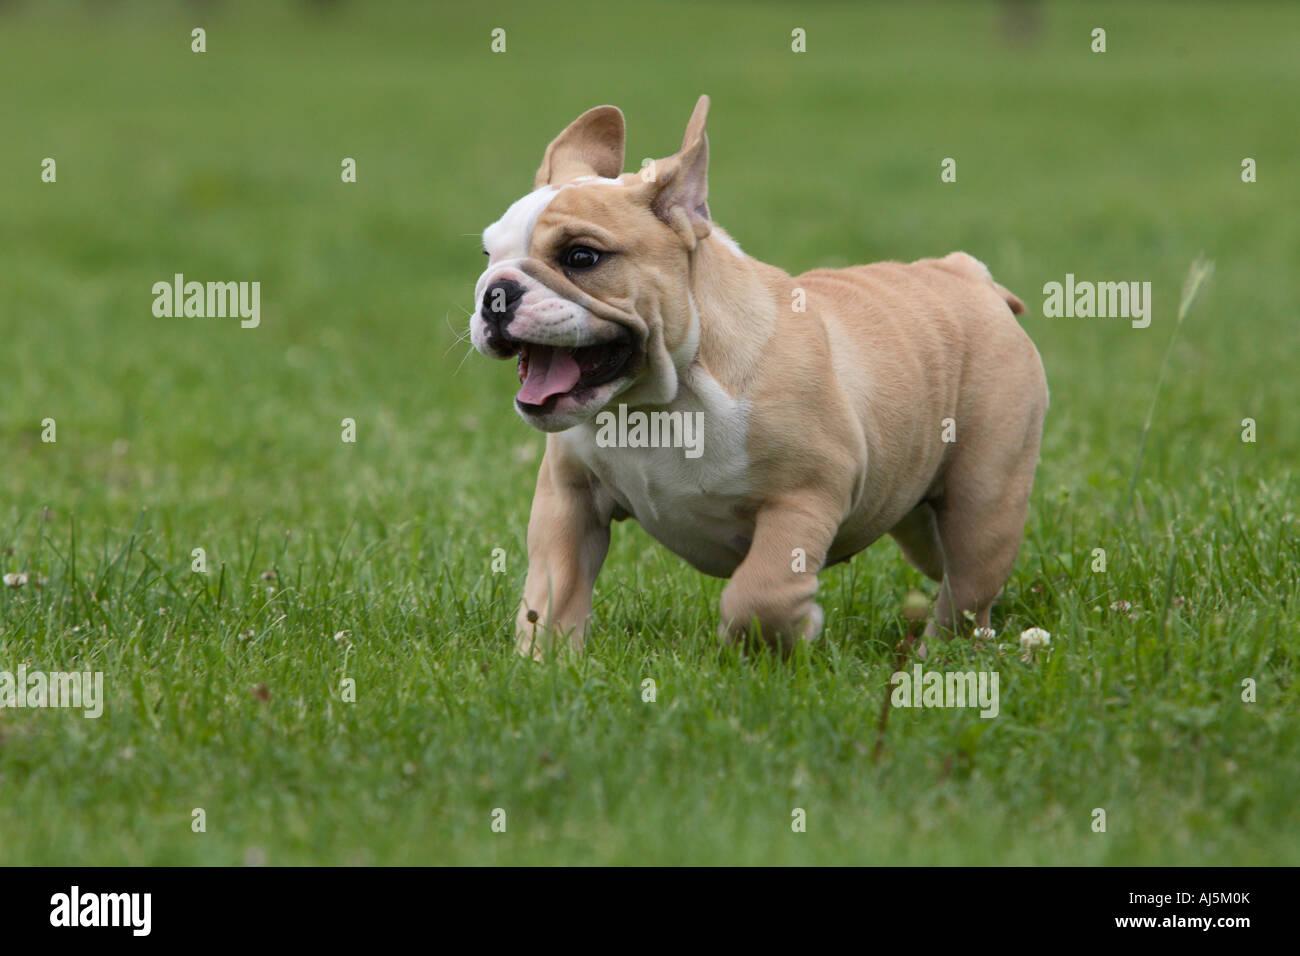 12 Week Old English Bulldog Puppy Running Stock Photo 14629890 Alamy